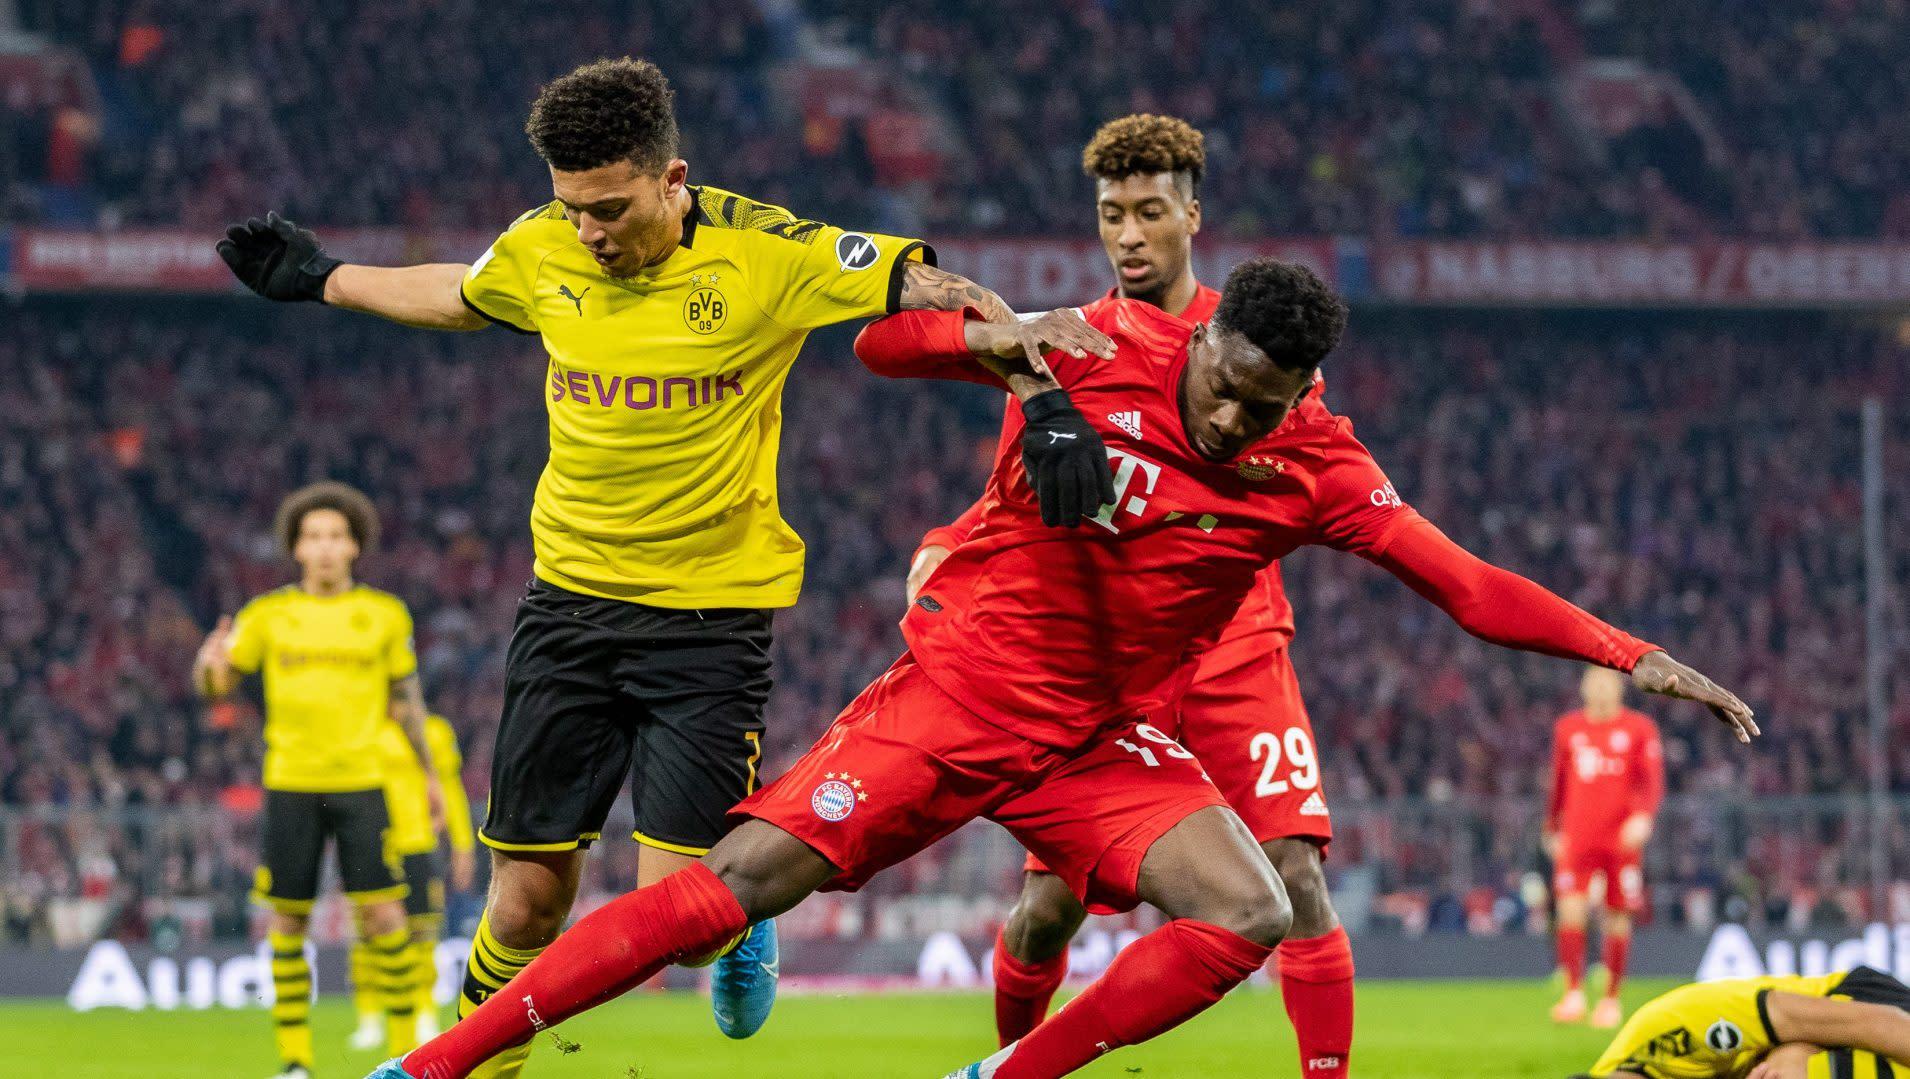 Report: Bundesliga to get Wednesday 'green light' for quick return